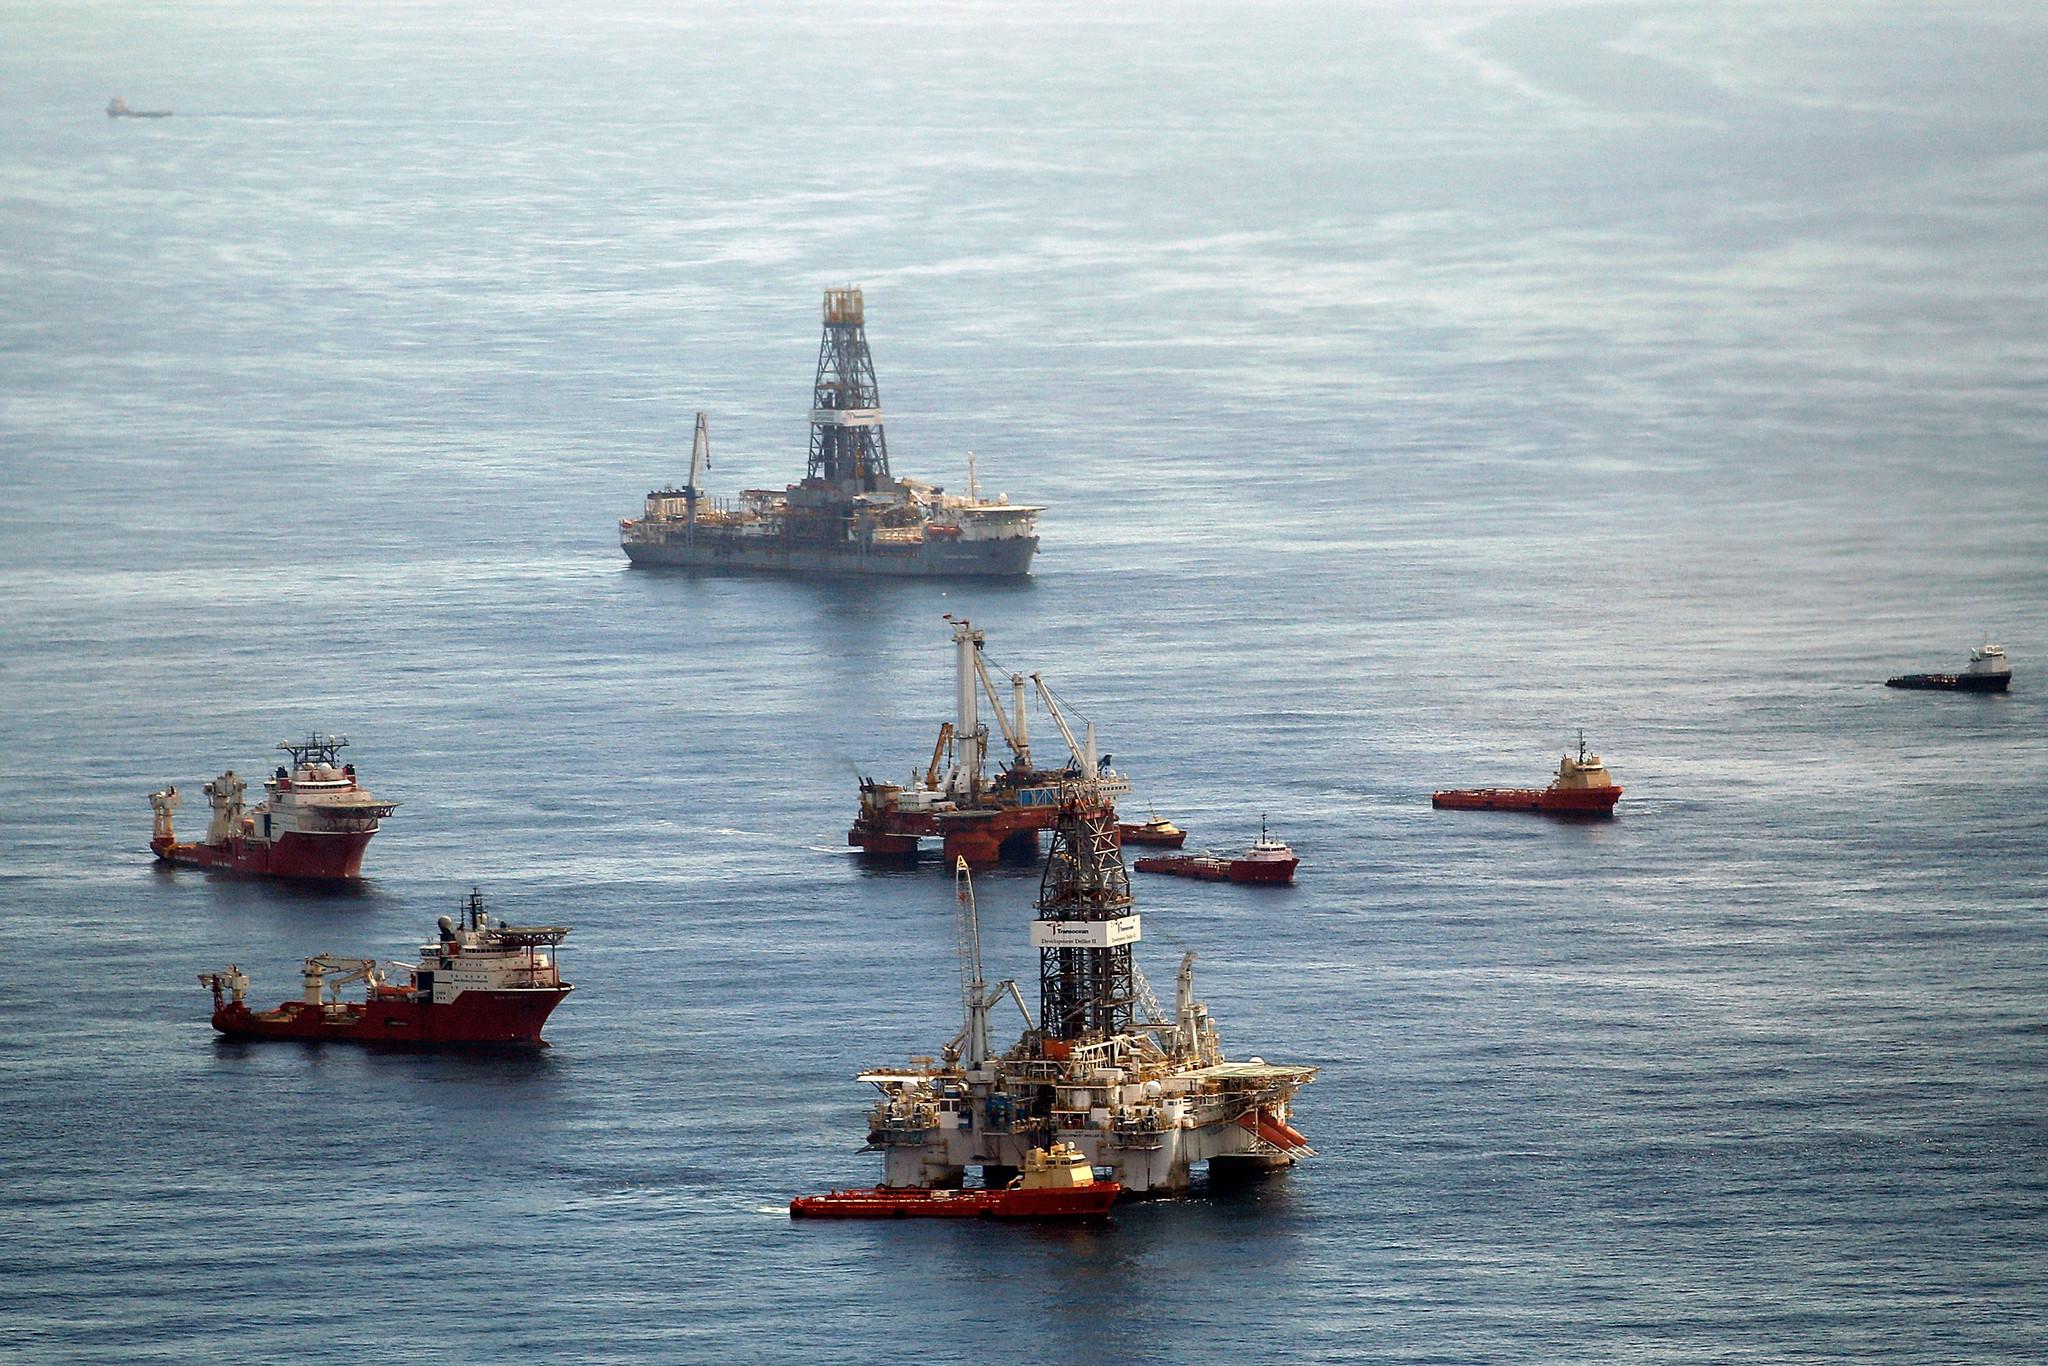 Halliburton agrees to pay $1.1 billion in Deepwater Horizon spill